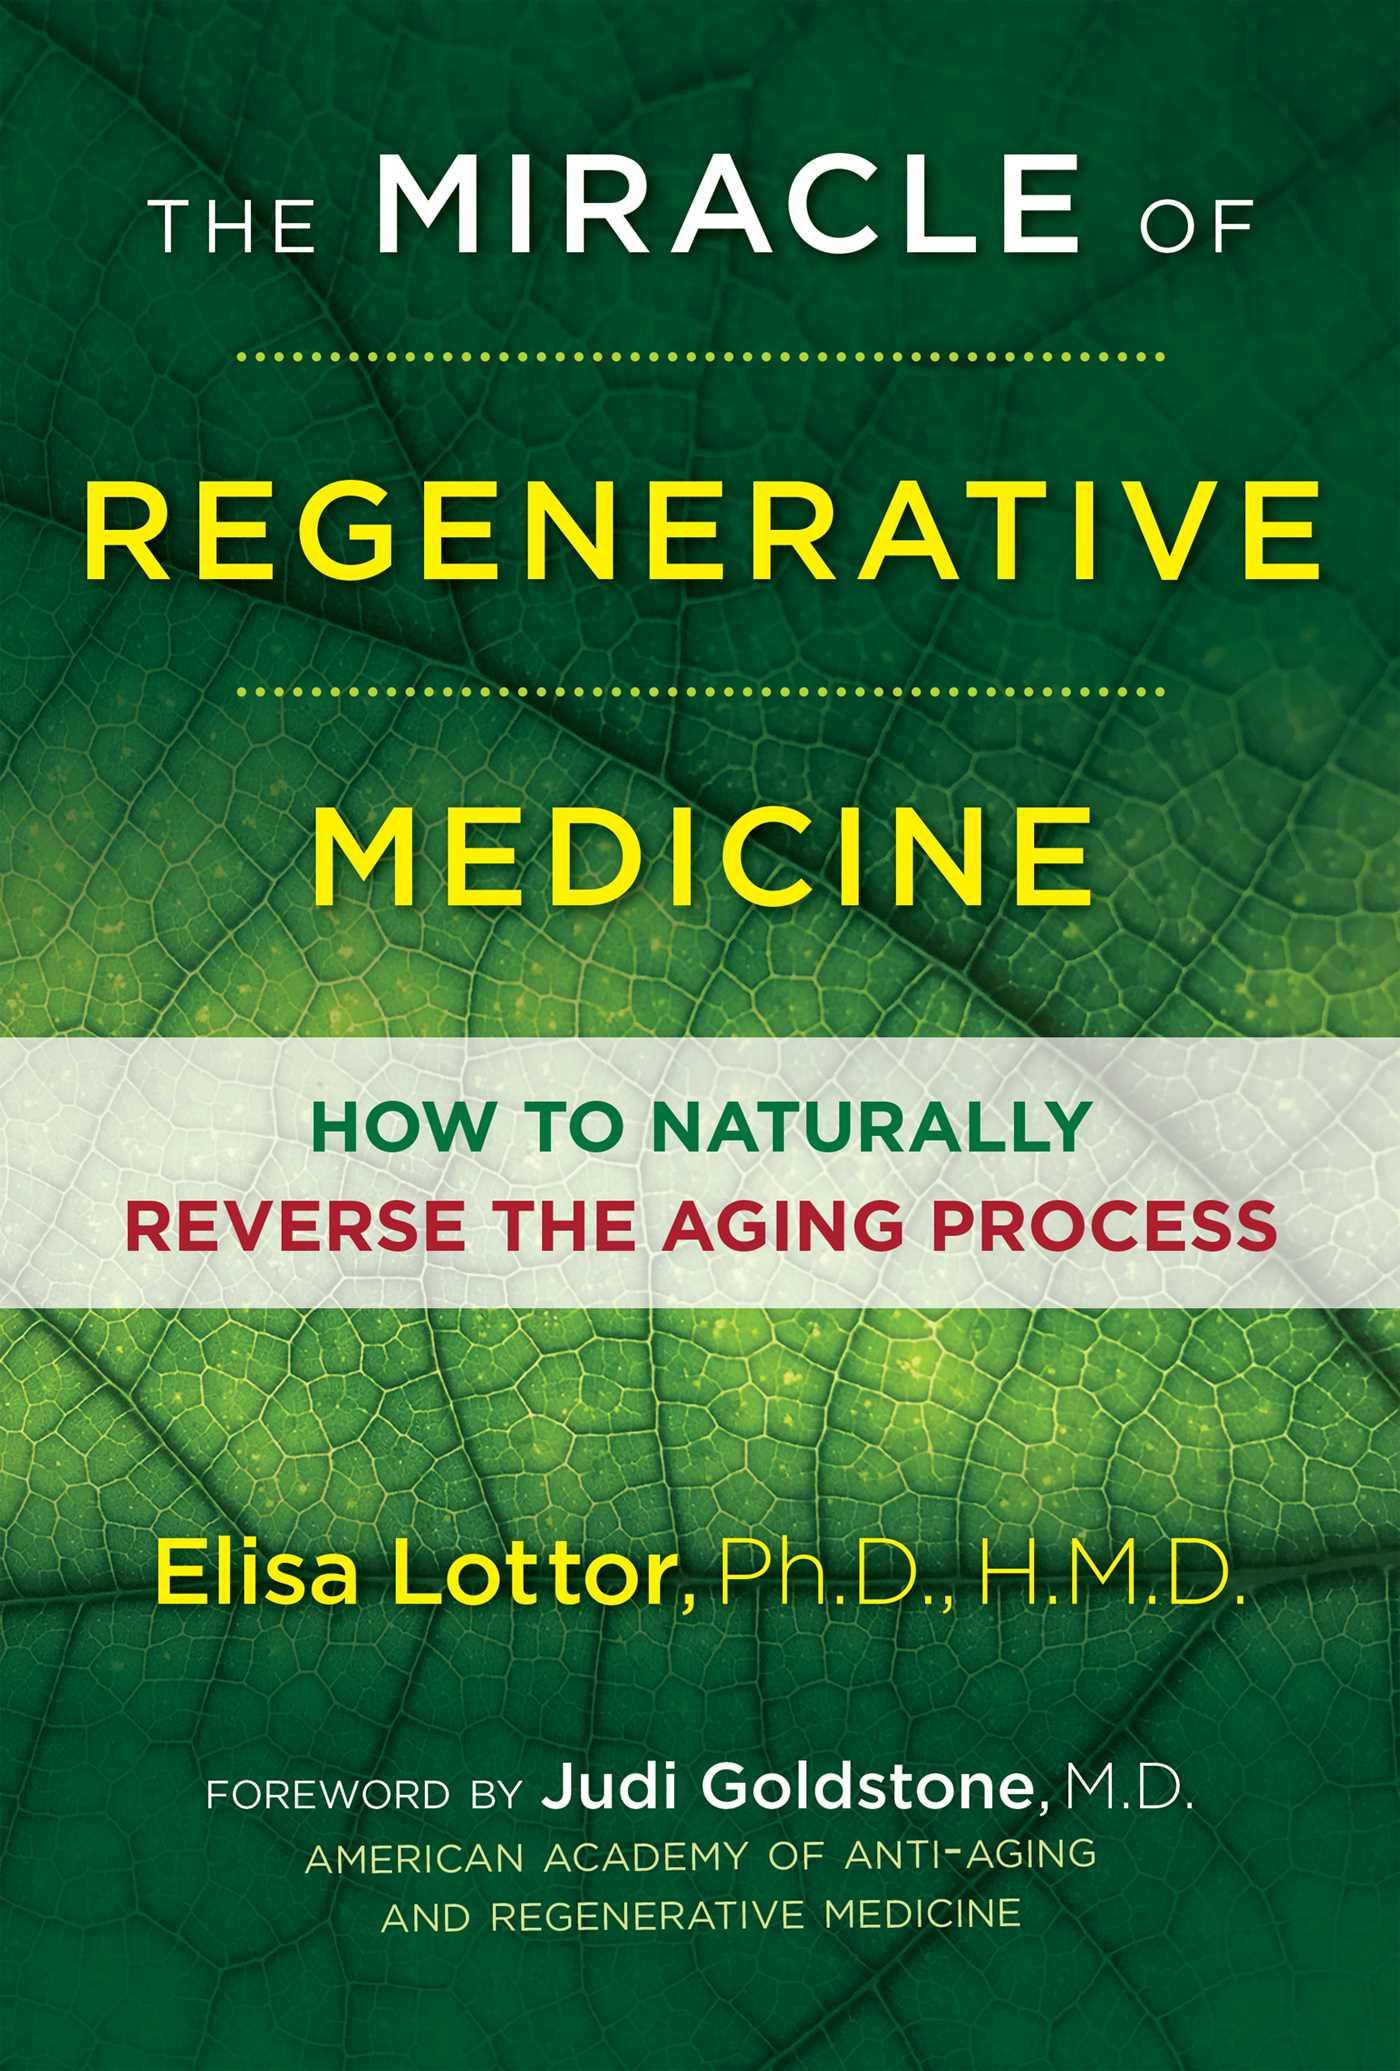 The miracle of regenerative medicine 9781620556047 hr